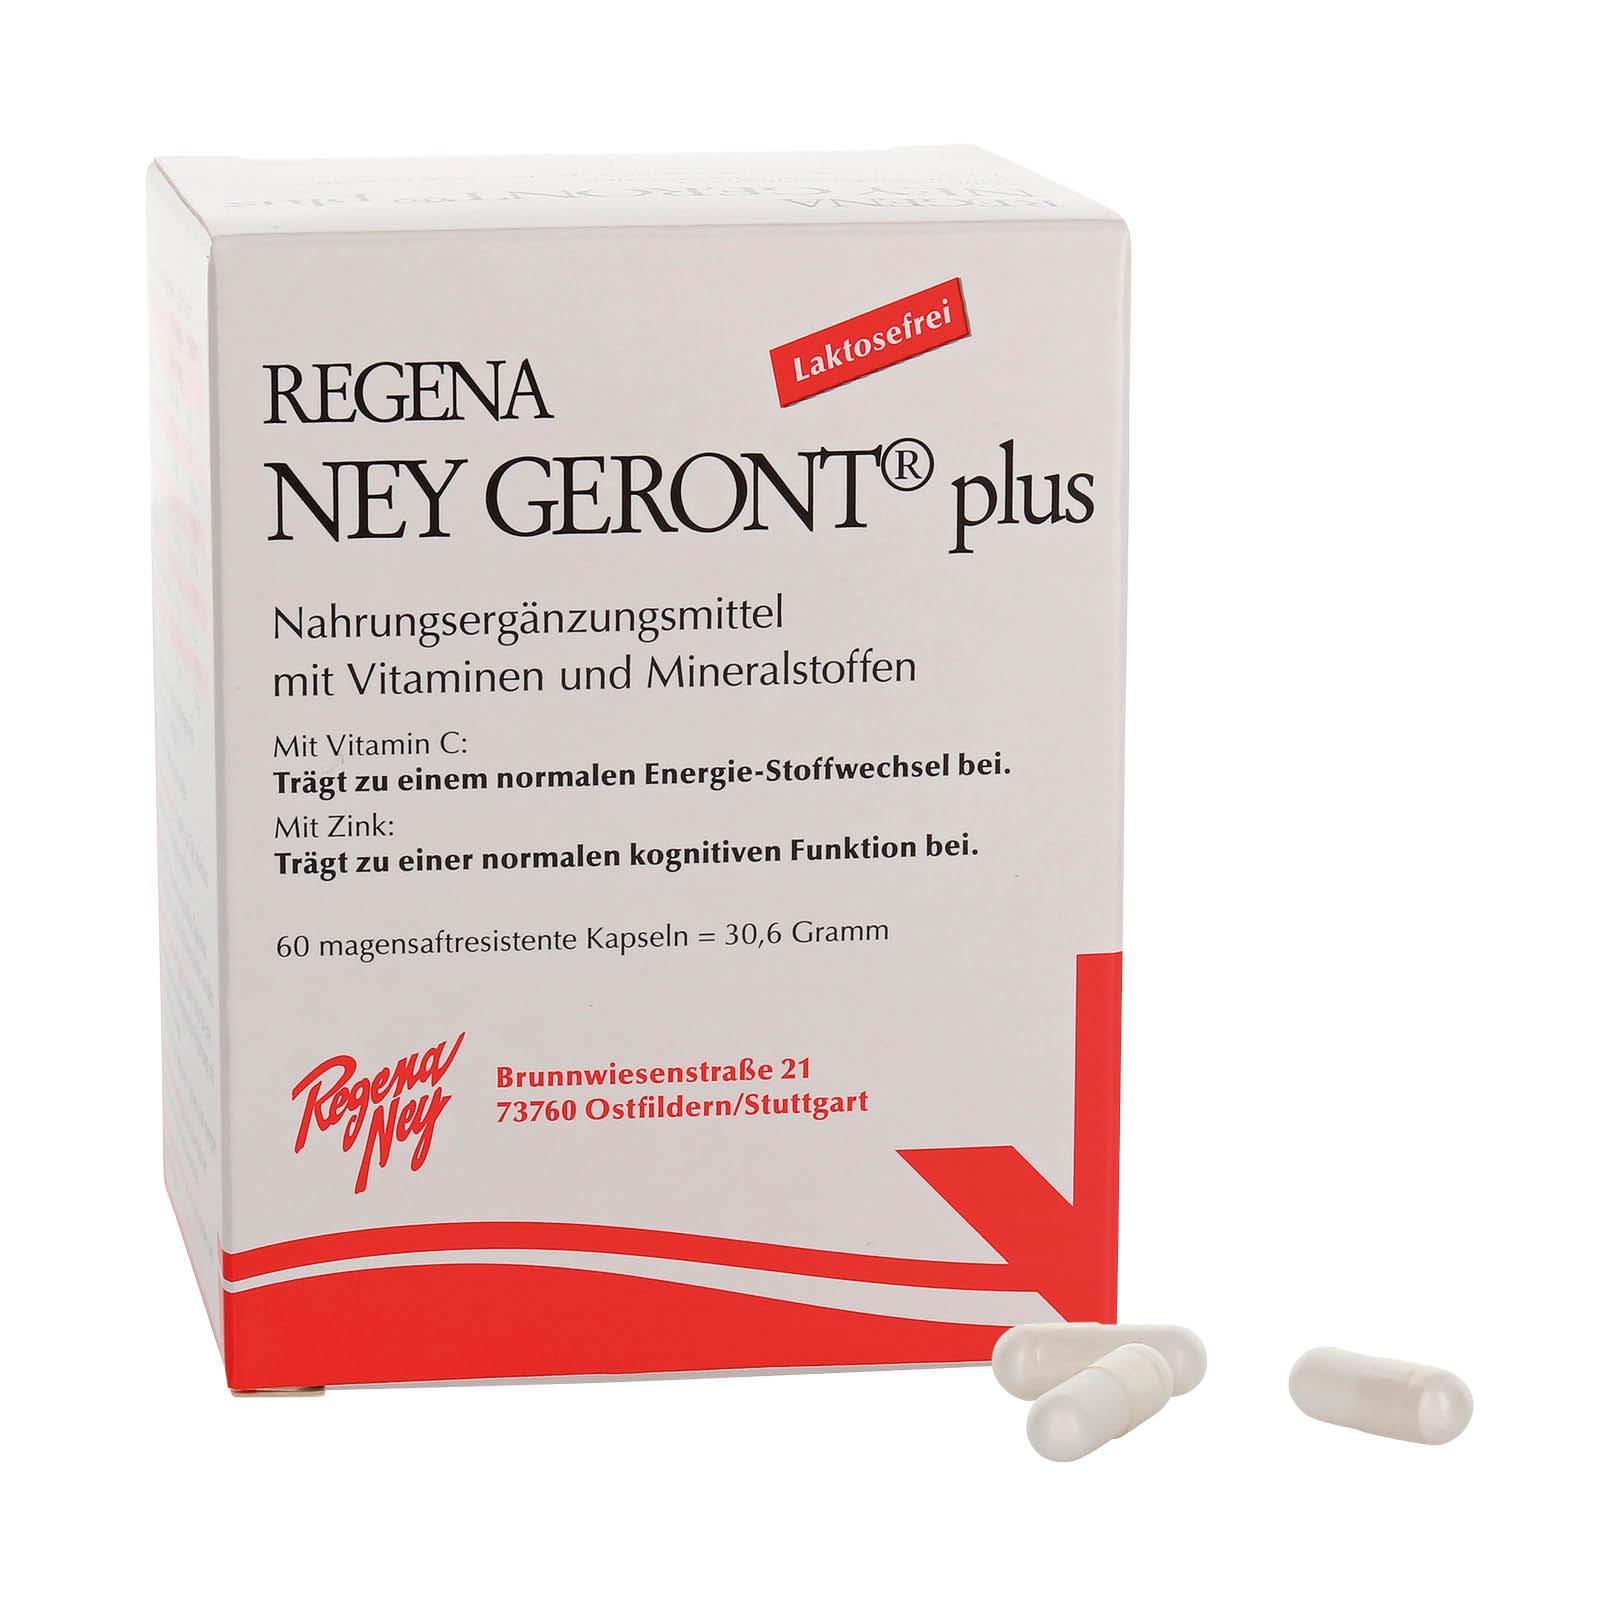 Regena NEY GERONT® plus